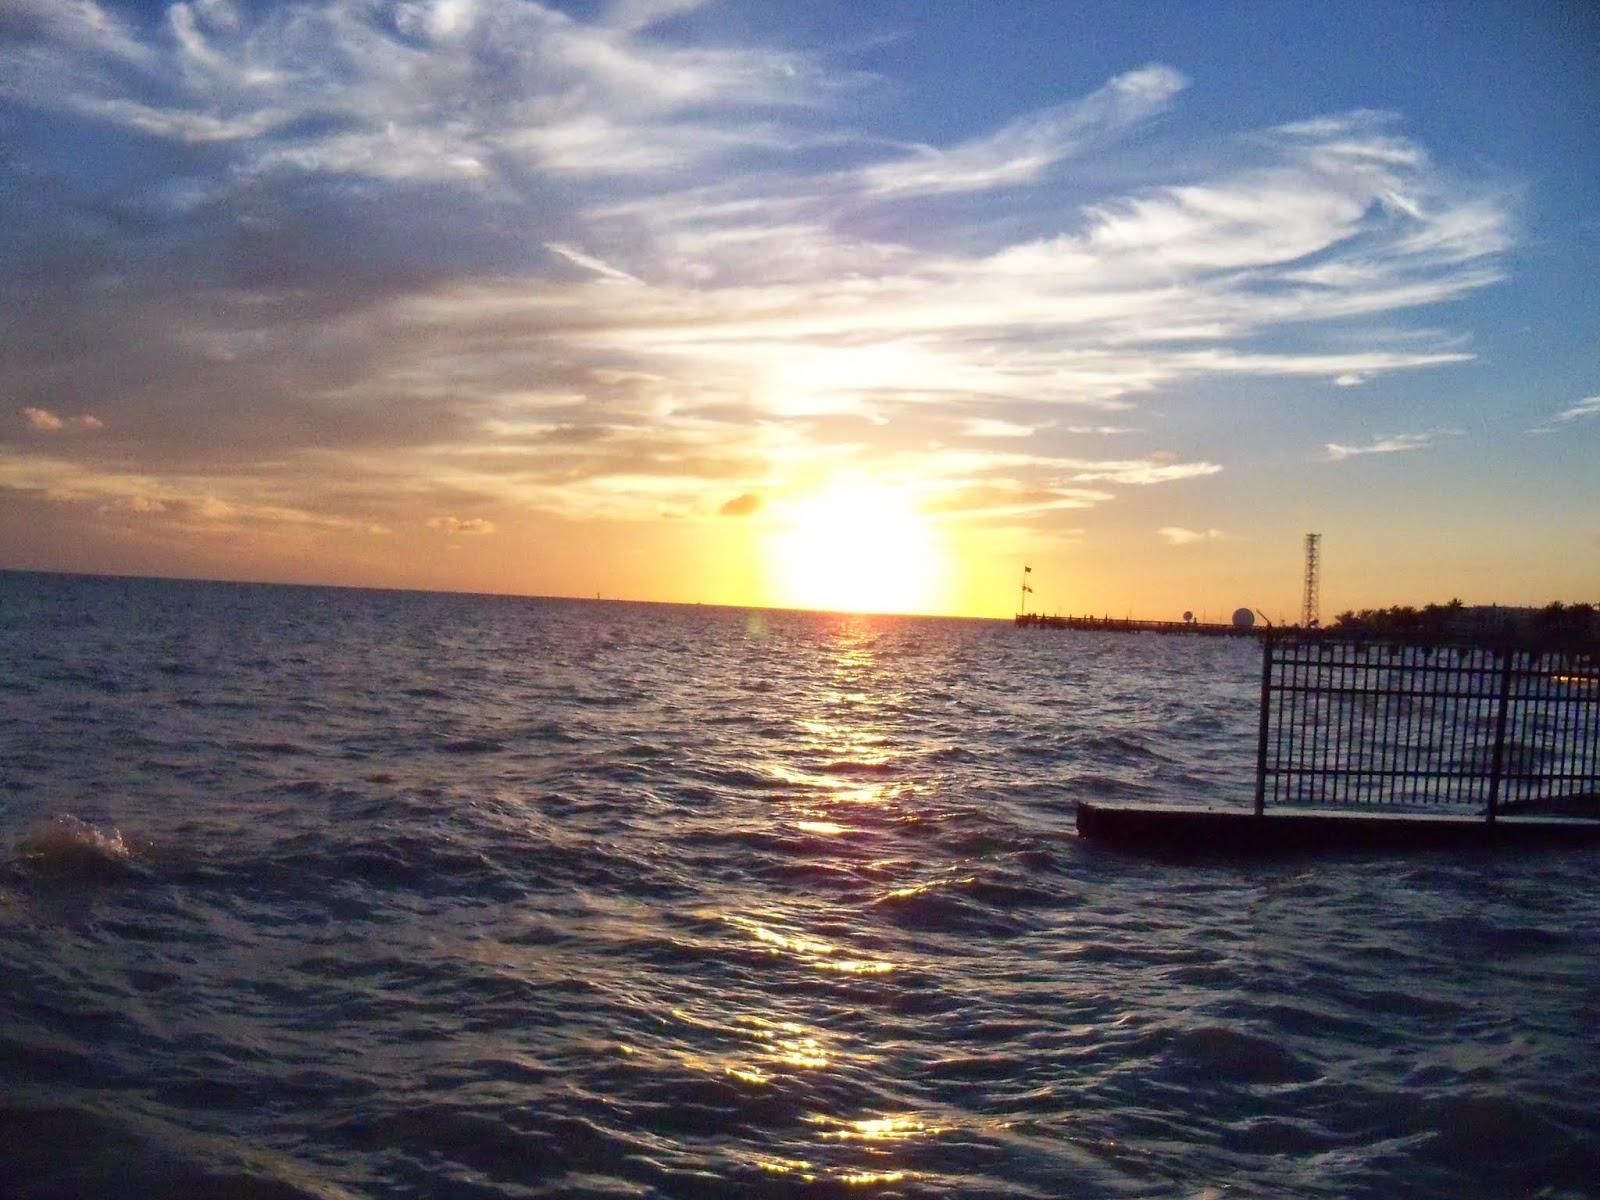 Key West Vacation - 116_5570.JPG